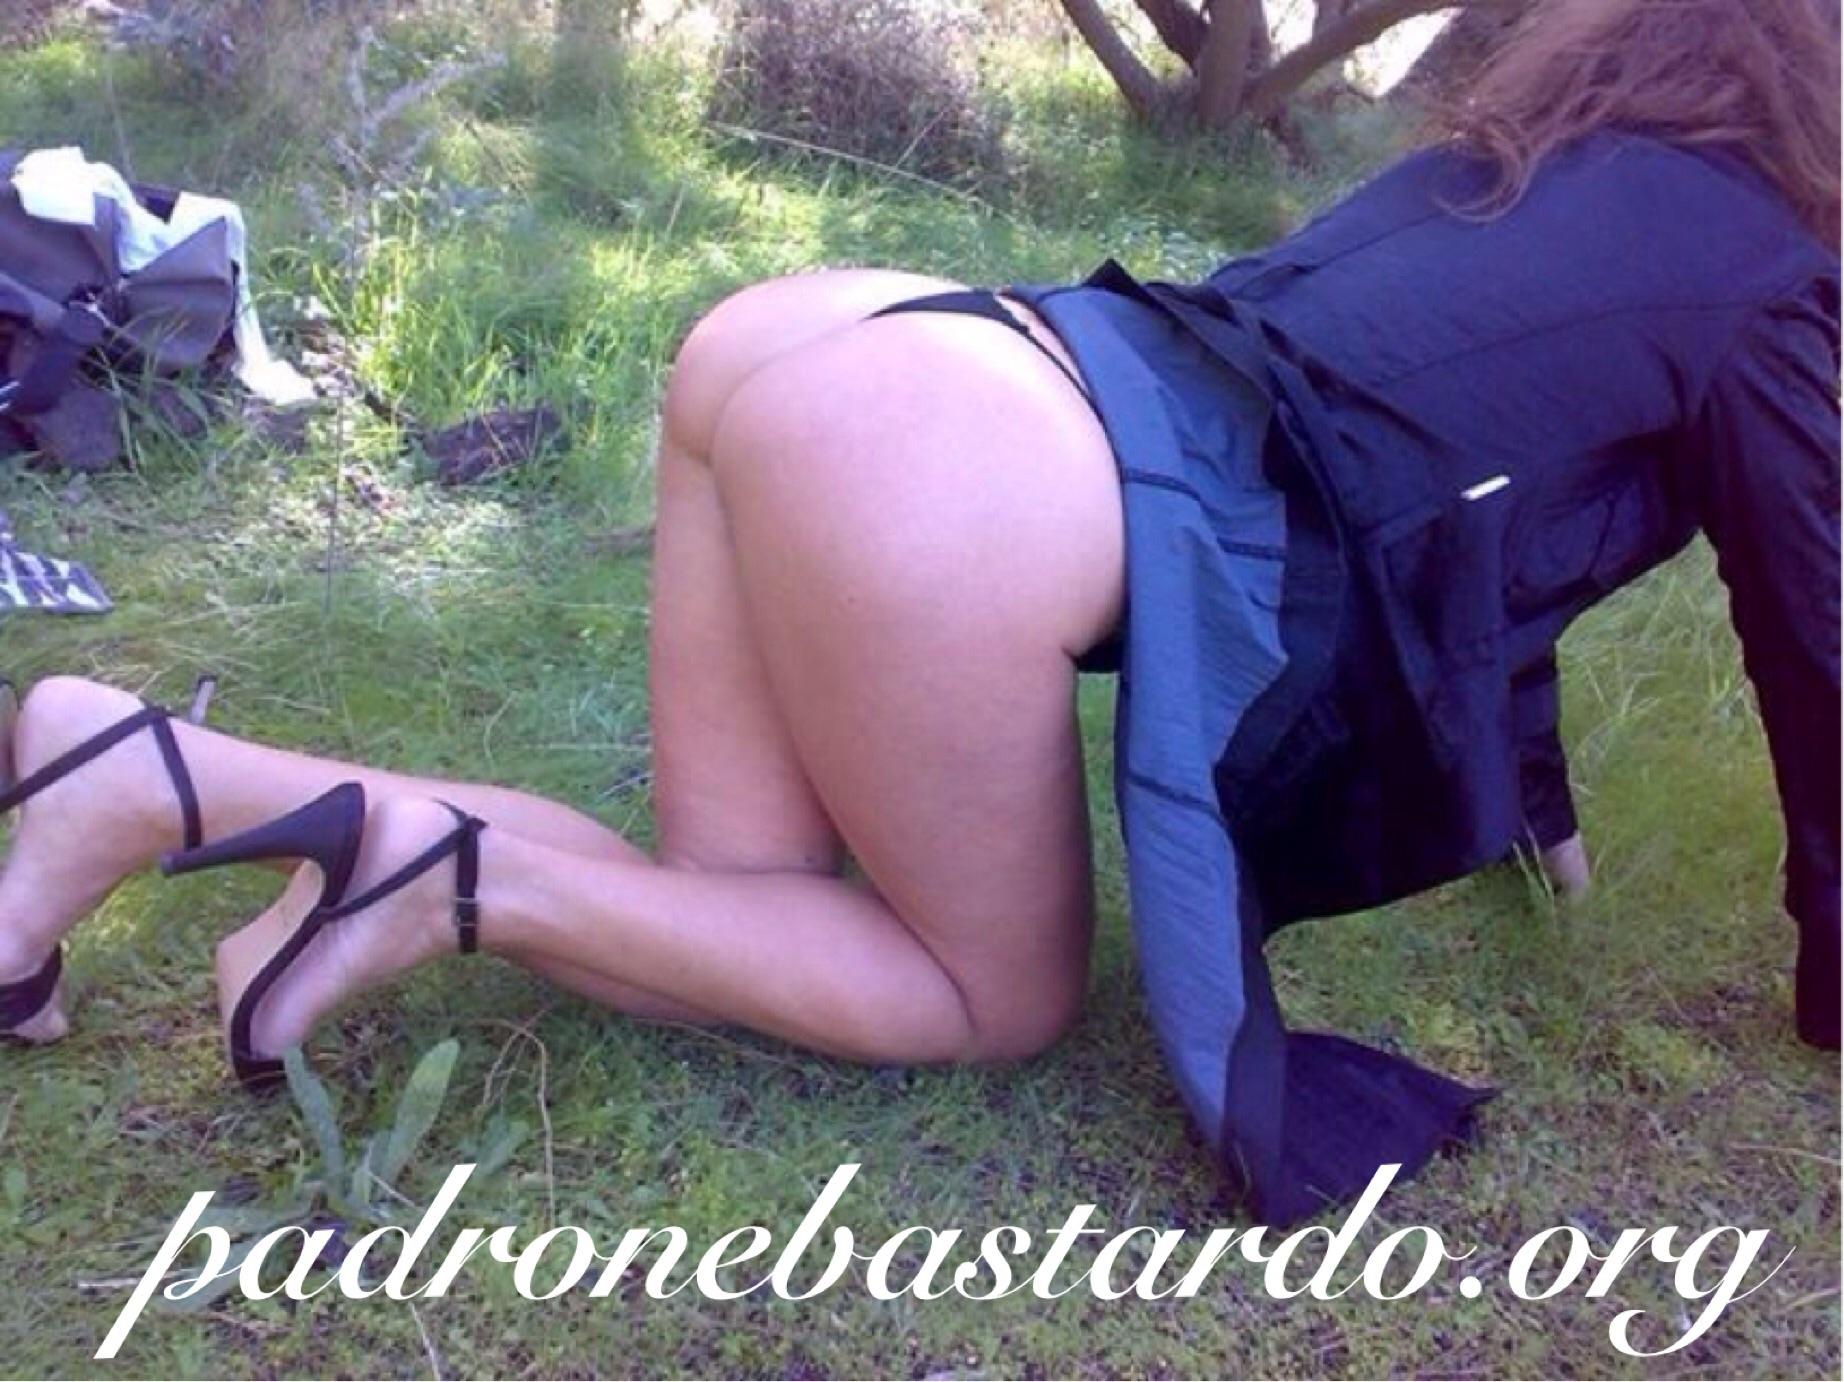 Milf Slave ready to punishment in pubblic garden